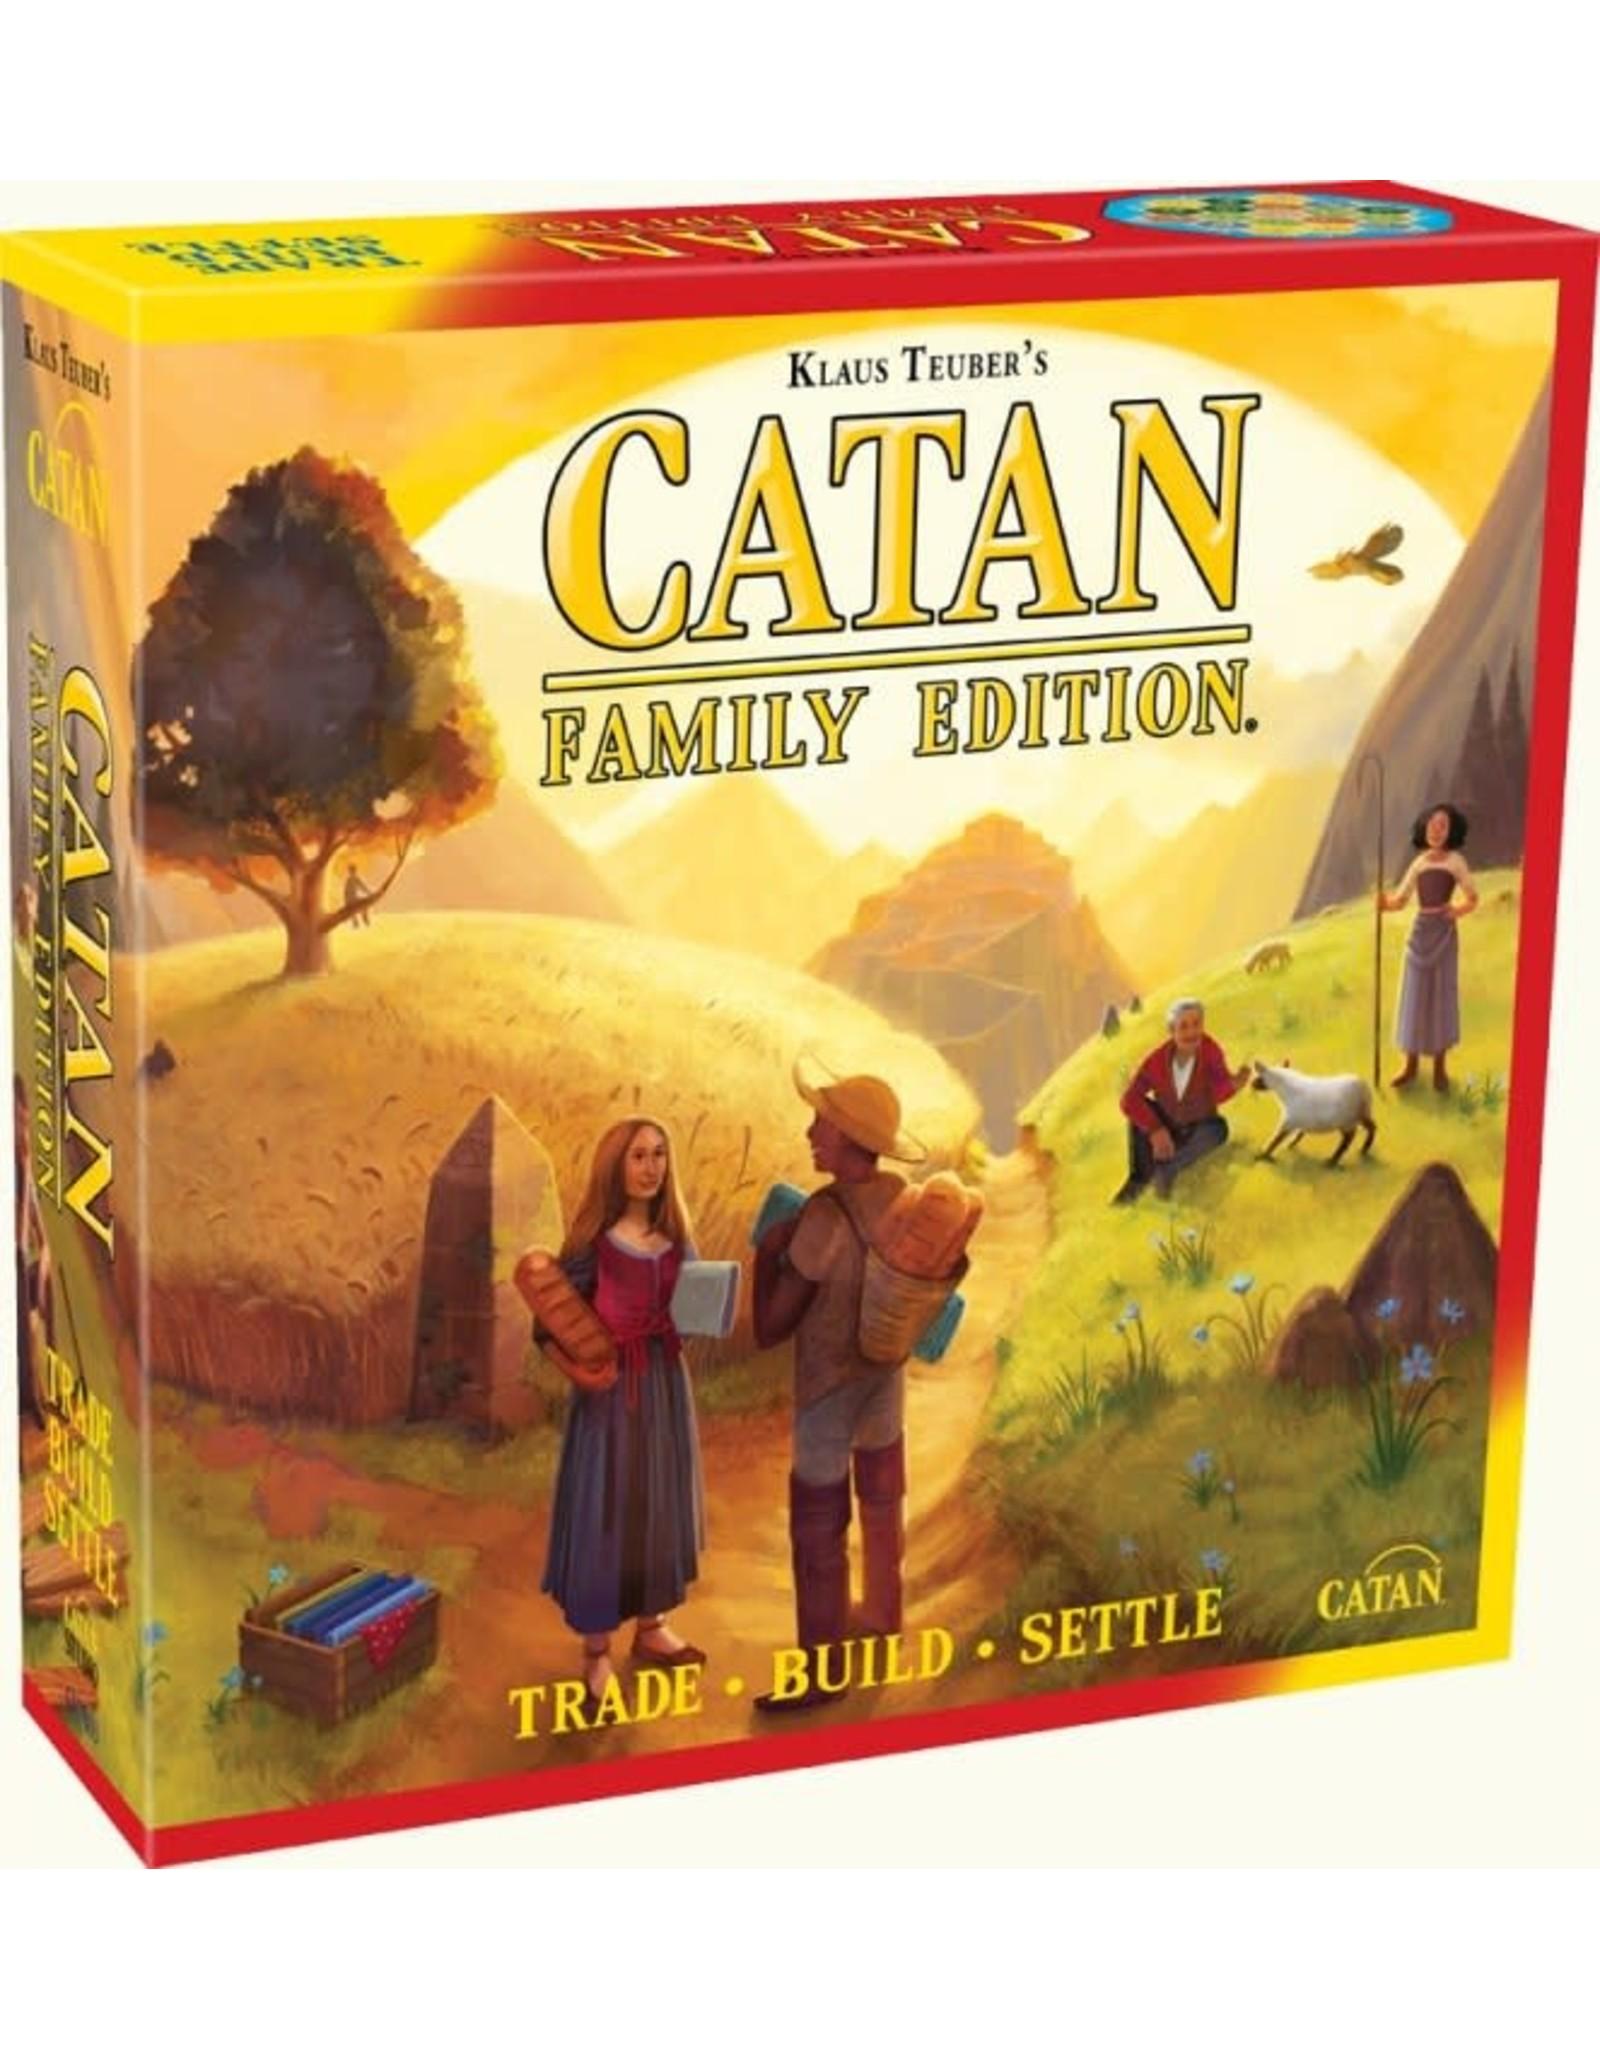 Catan Studio Catan: Family Edition